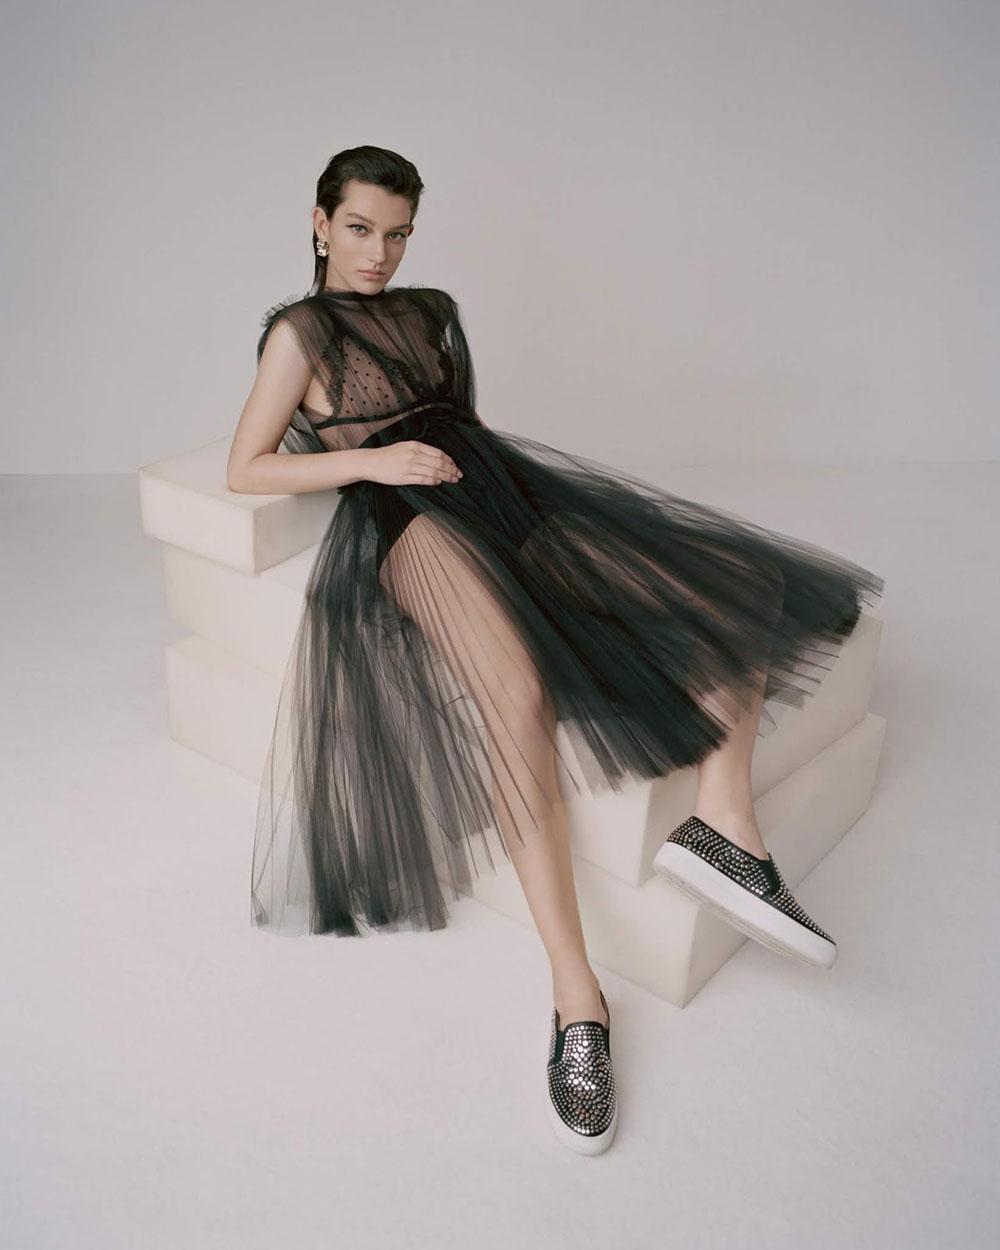 McKenna Hellam by Zoltan Tombor for Vogue Taiwan June 2019